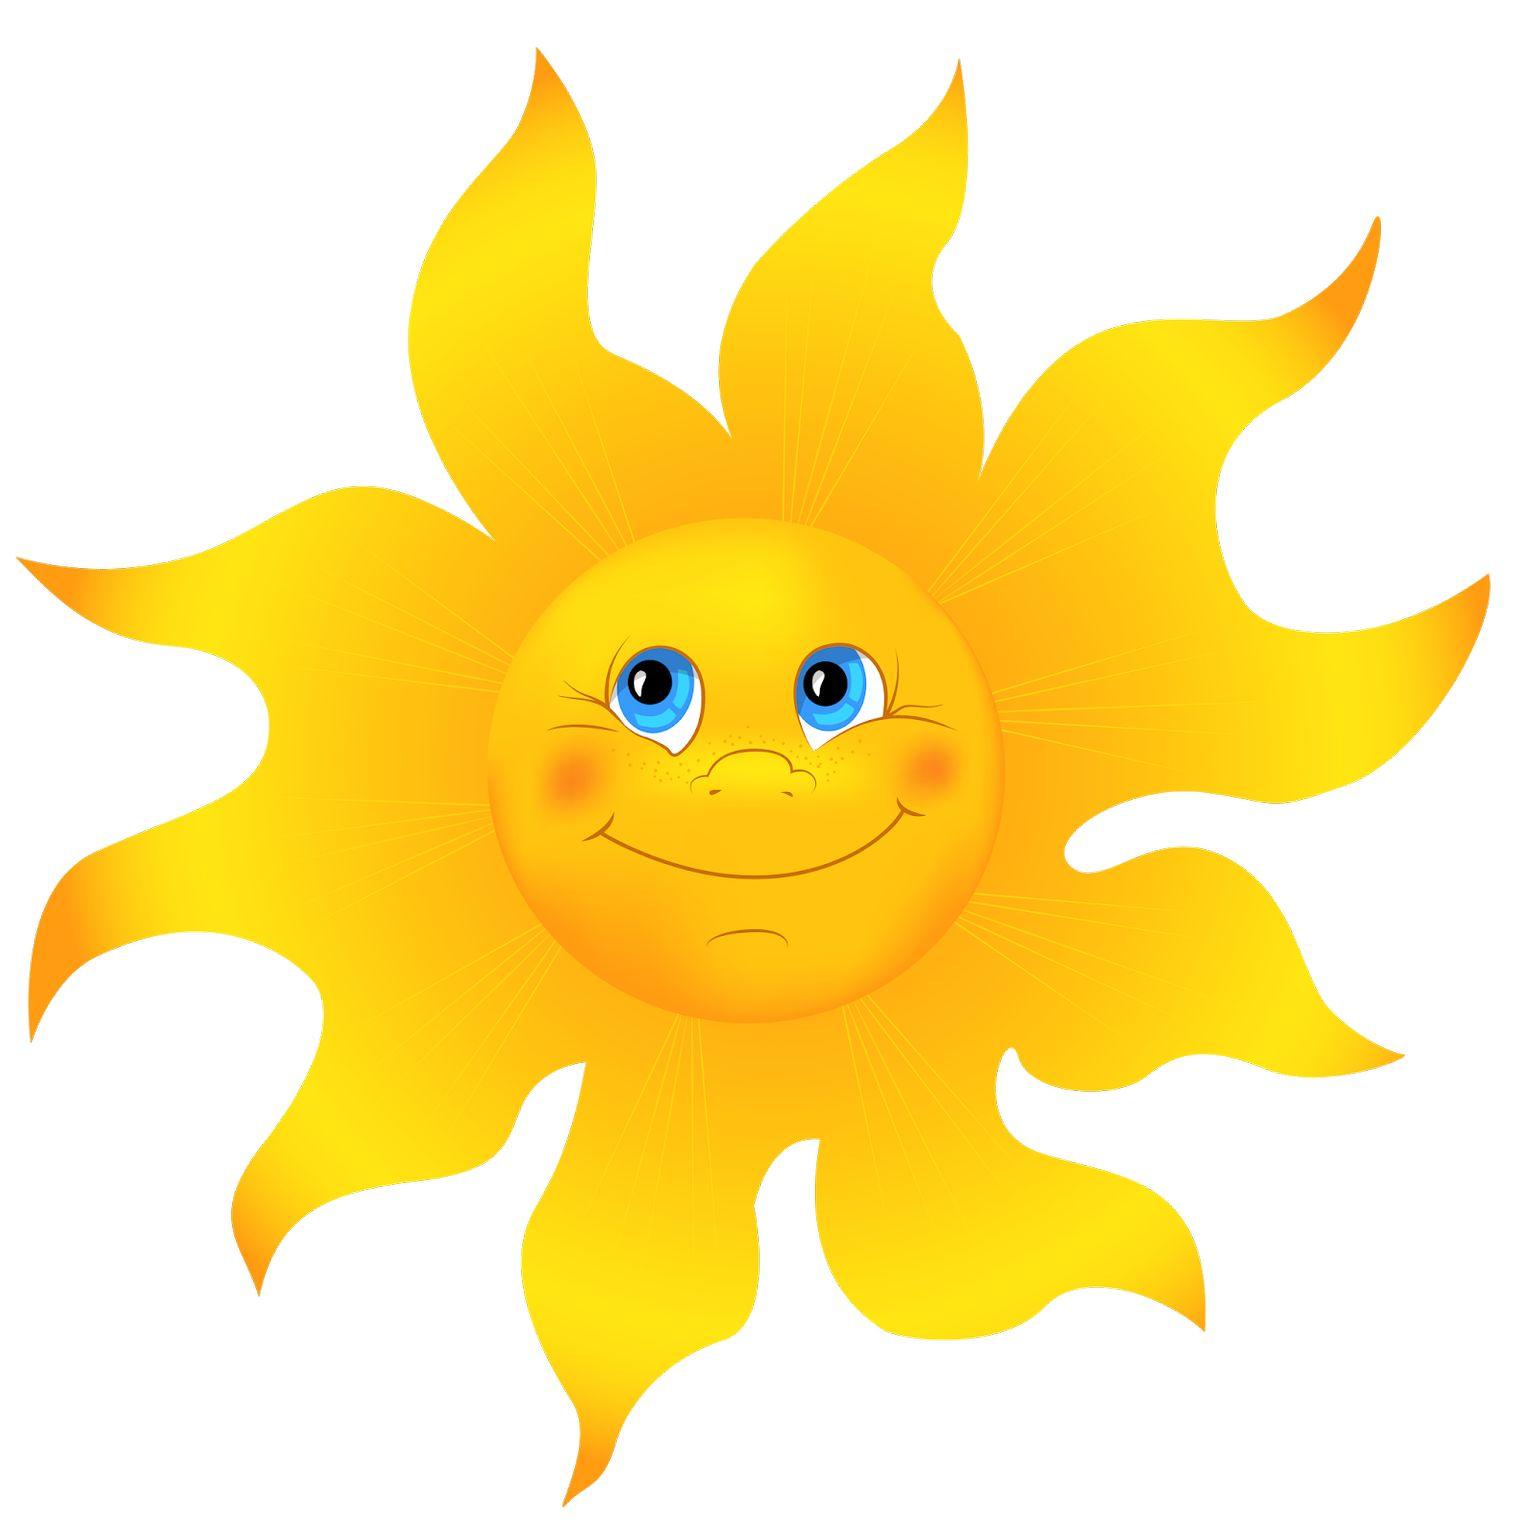 картинки солнышко солнце прожито, сколько нажито